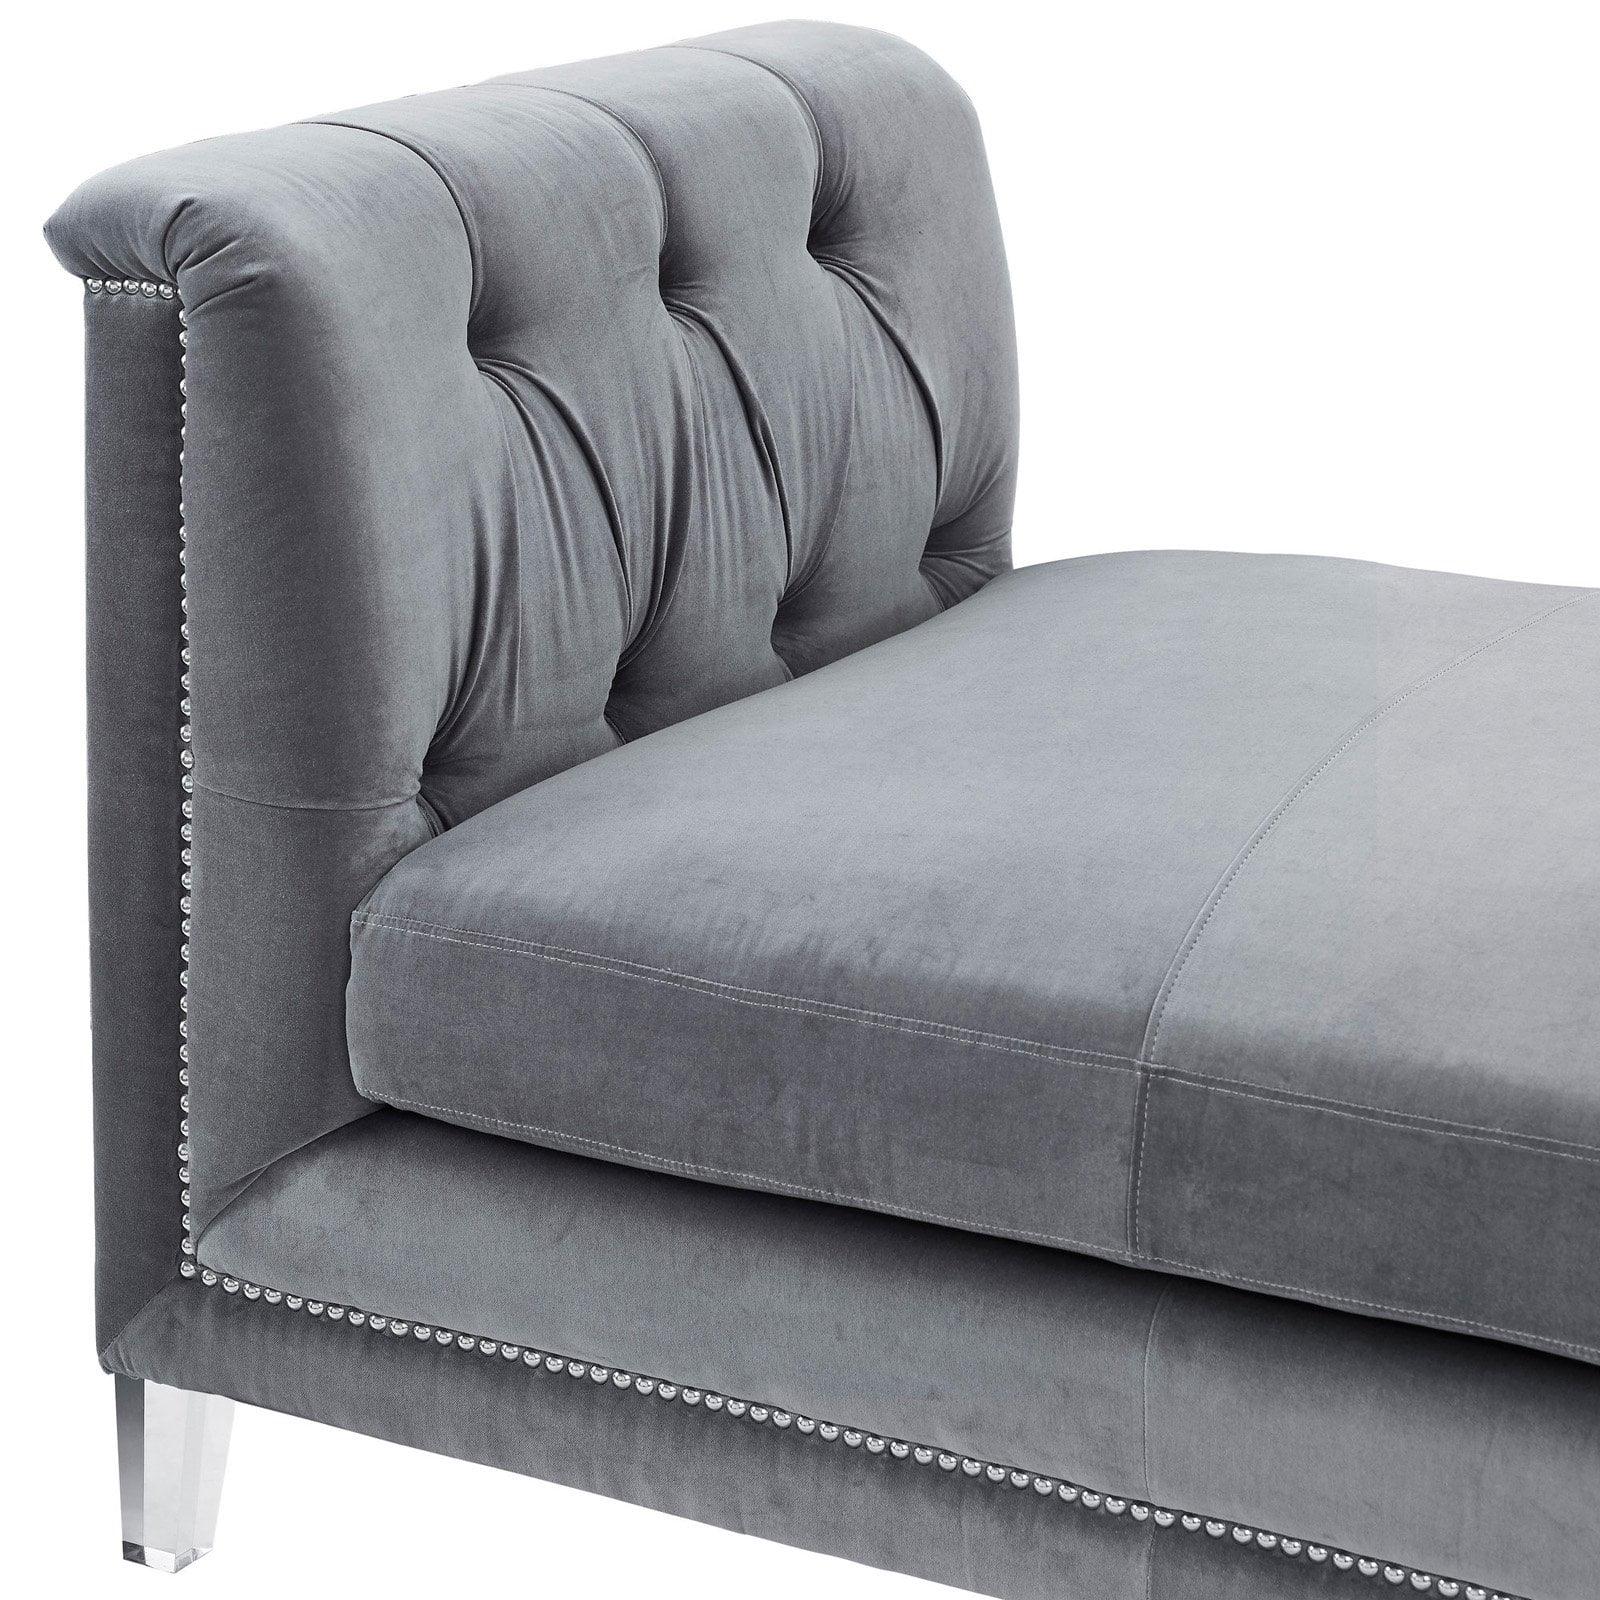 TOV Furniture Naomi Loveseat - Grey